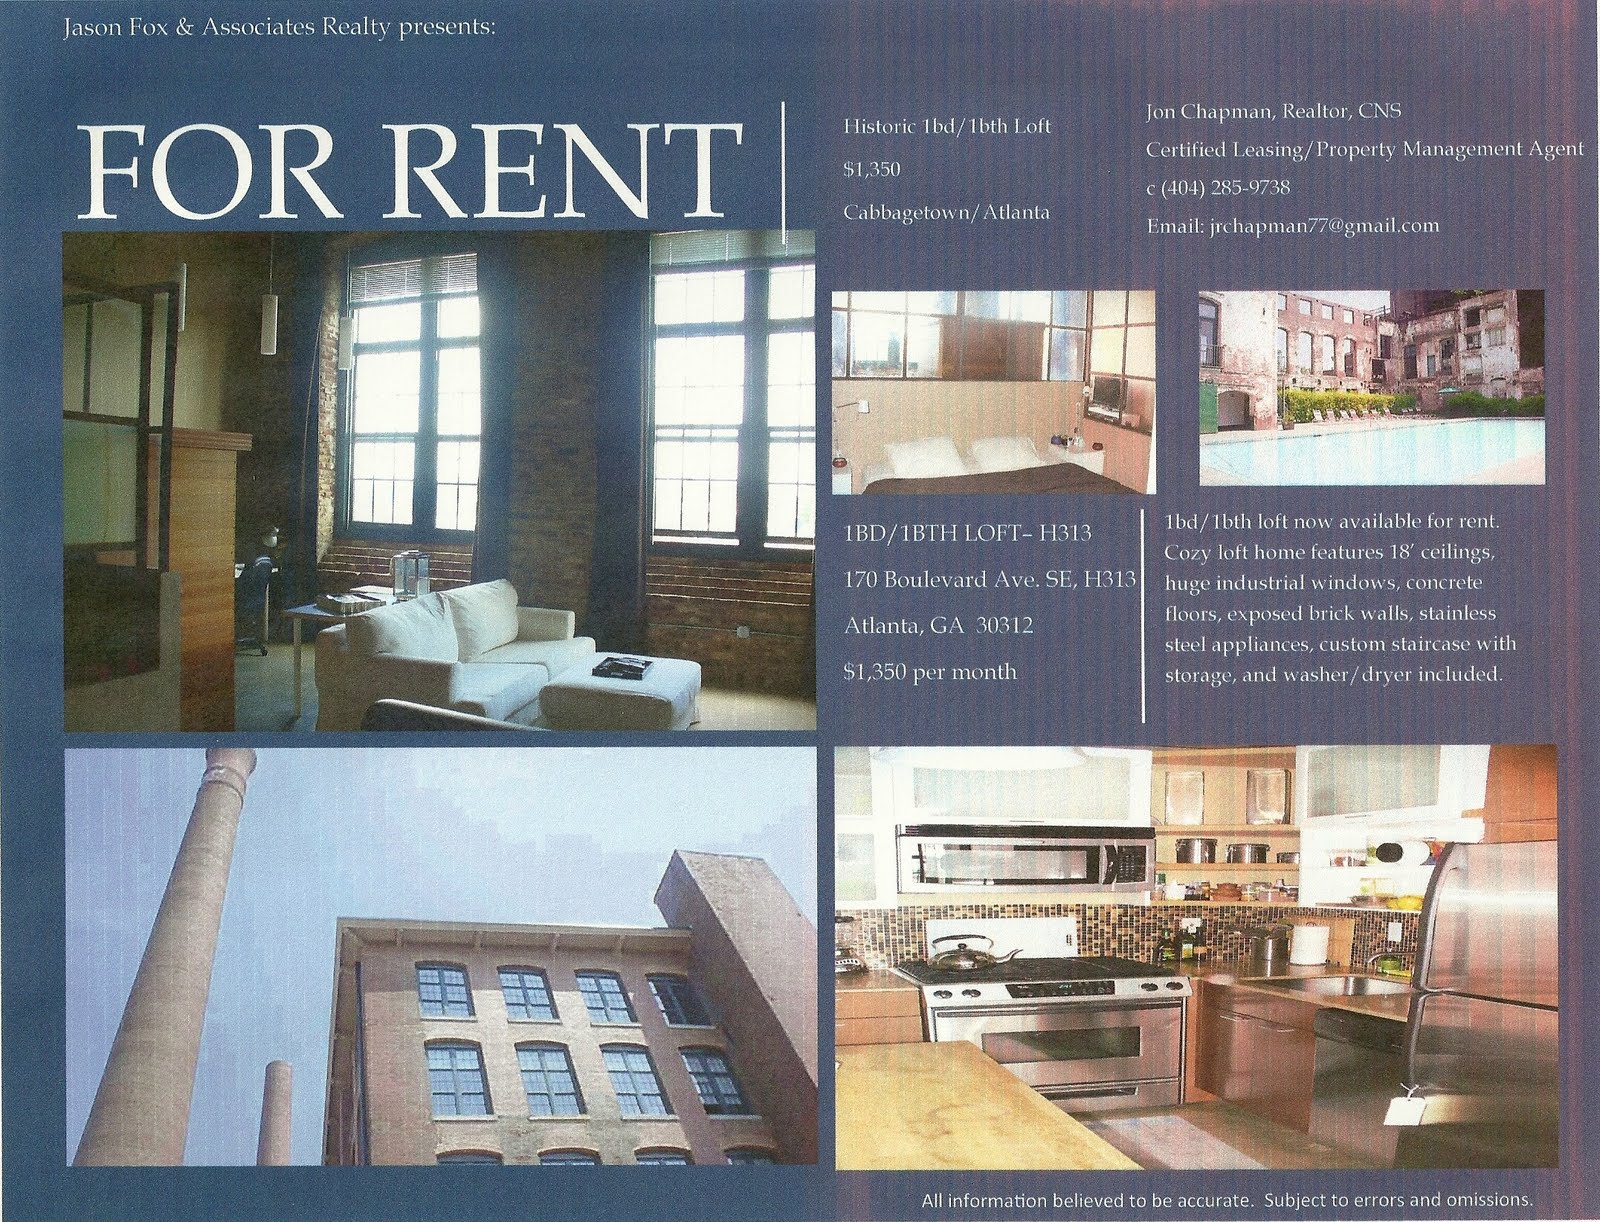 Atlanta Real Estate LEASED 1bd1bth Historic Loft at